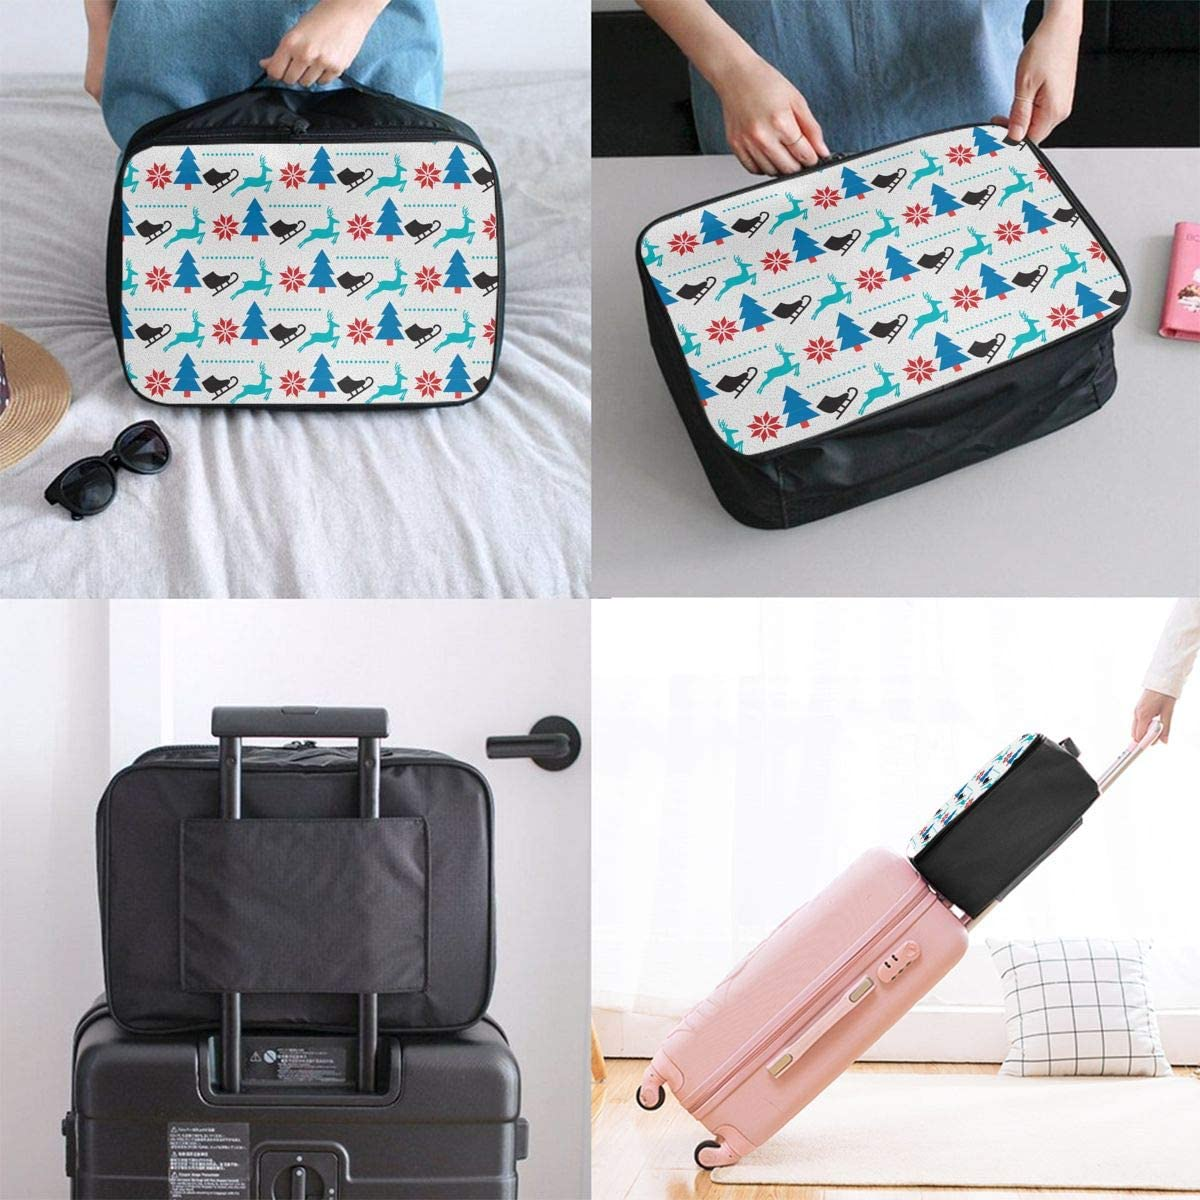 Chrismas Pattern Desgin Travel Carry-on Luggage Weekender Bag Overnight Tote Flight Duffel In Trolley Handle